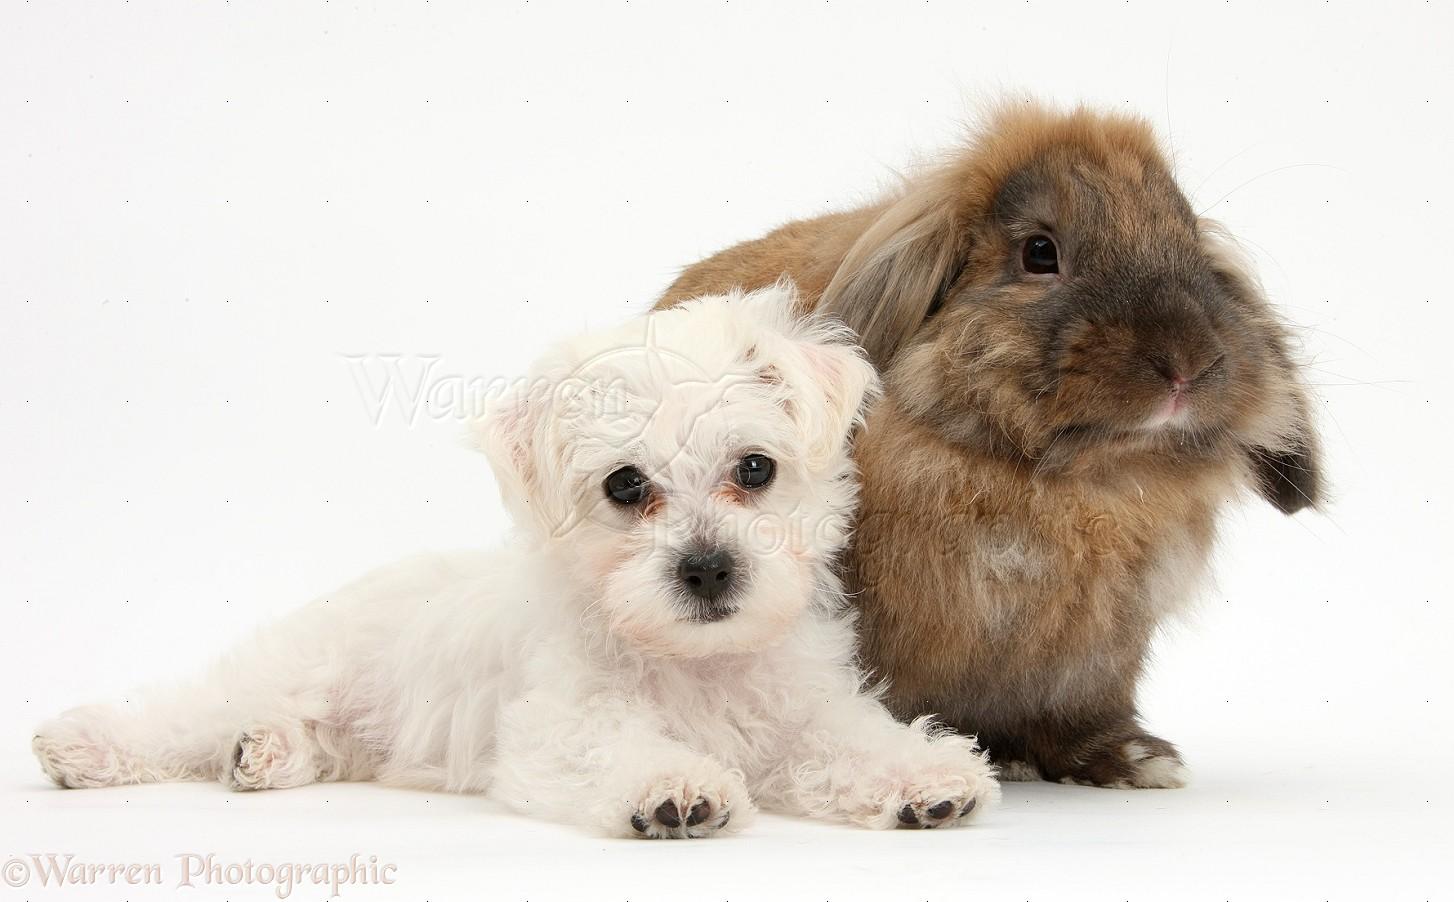 Pets: Cute white Bichon x Yorkie puppy and rabbit photo - WP39065